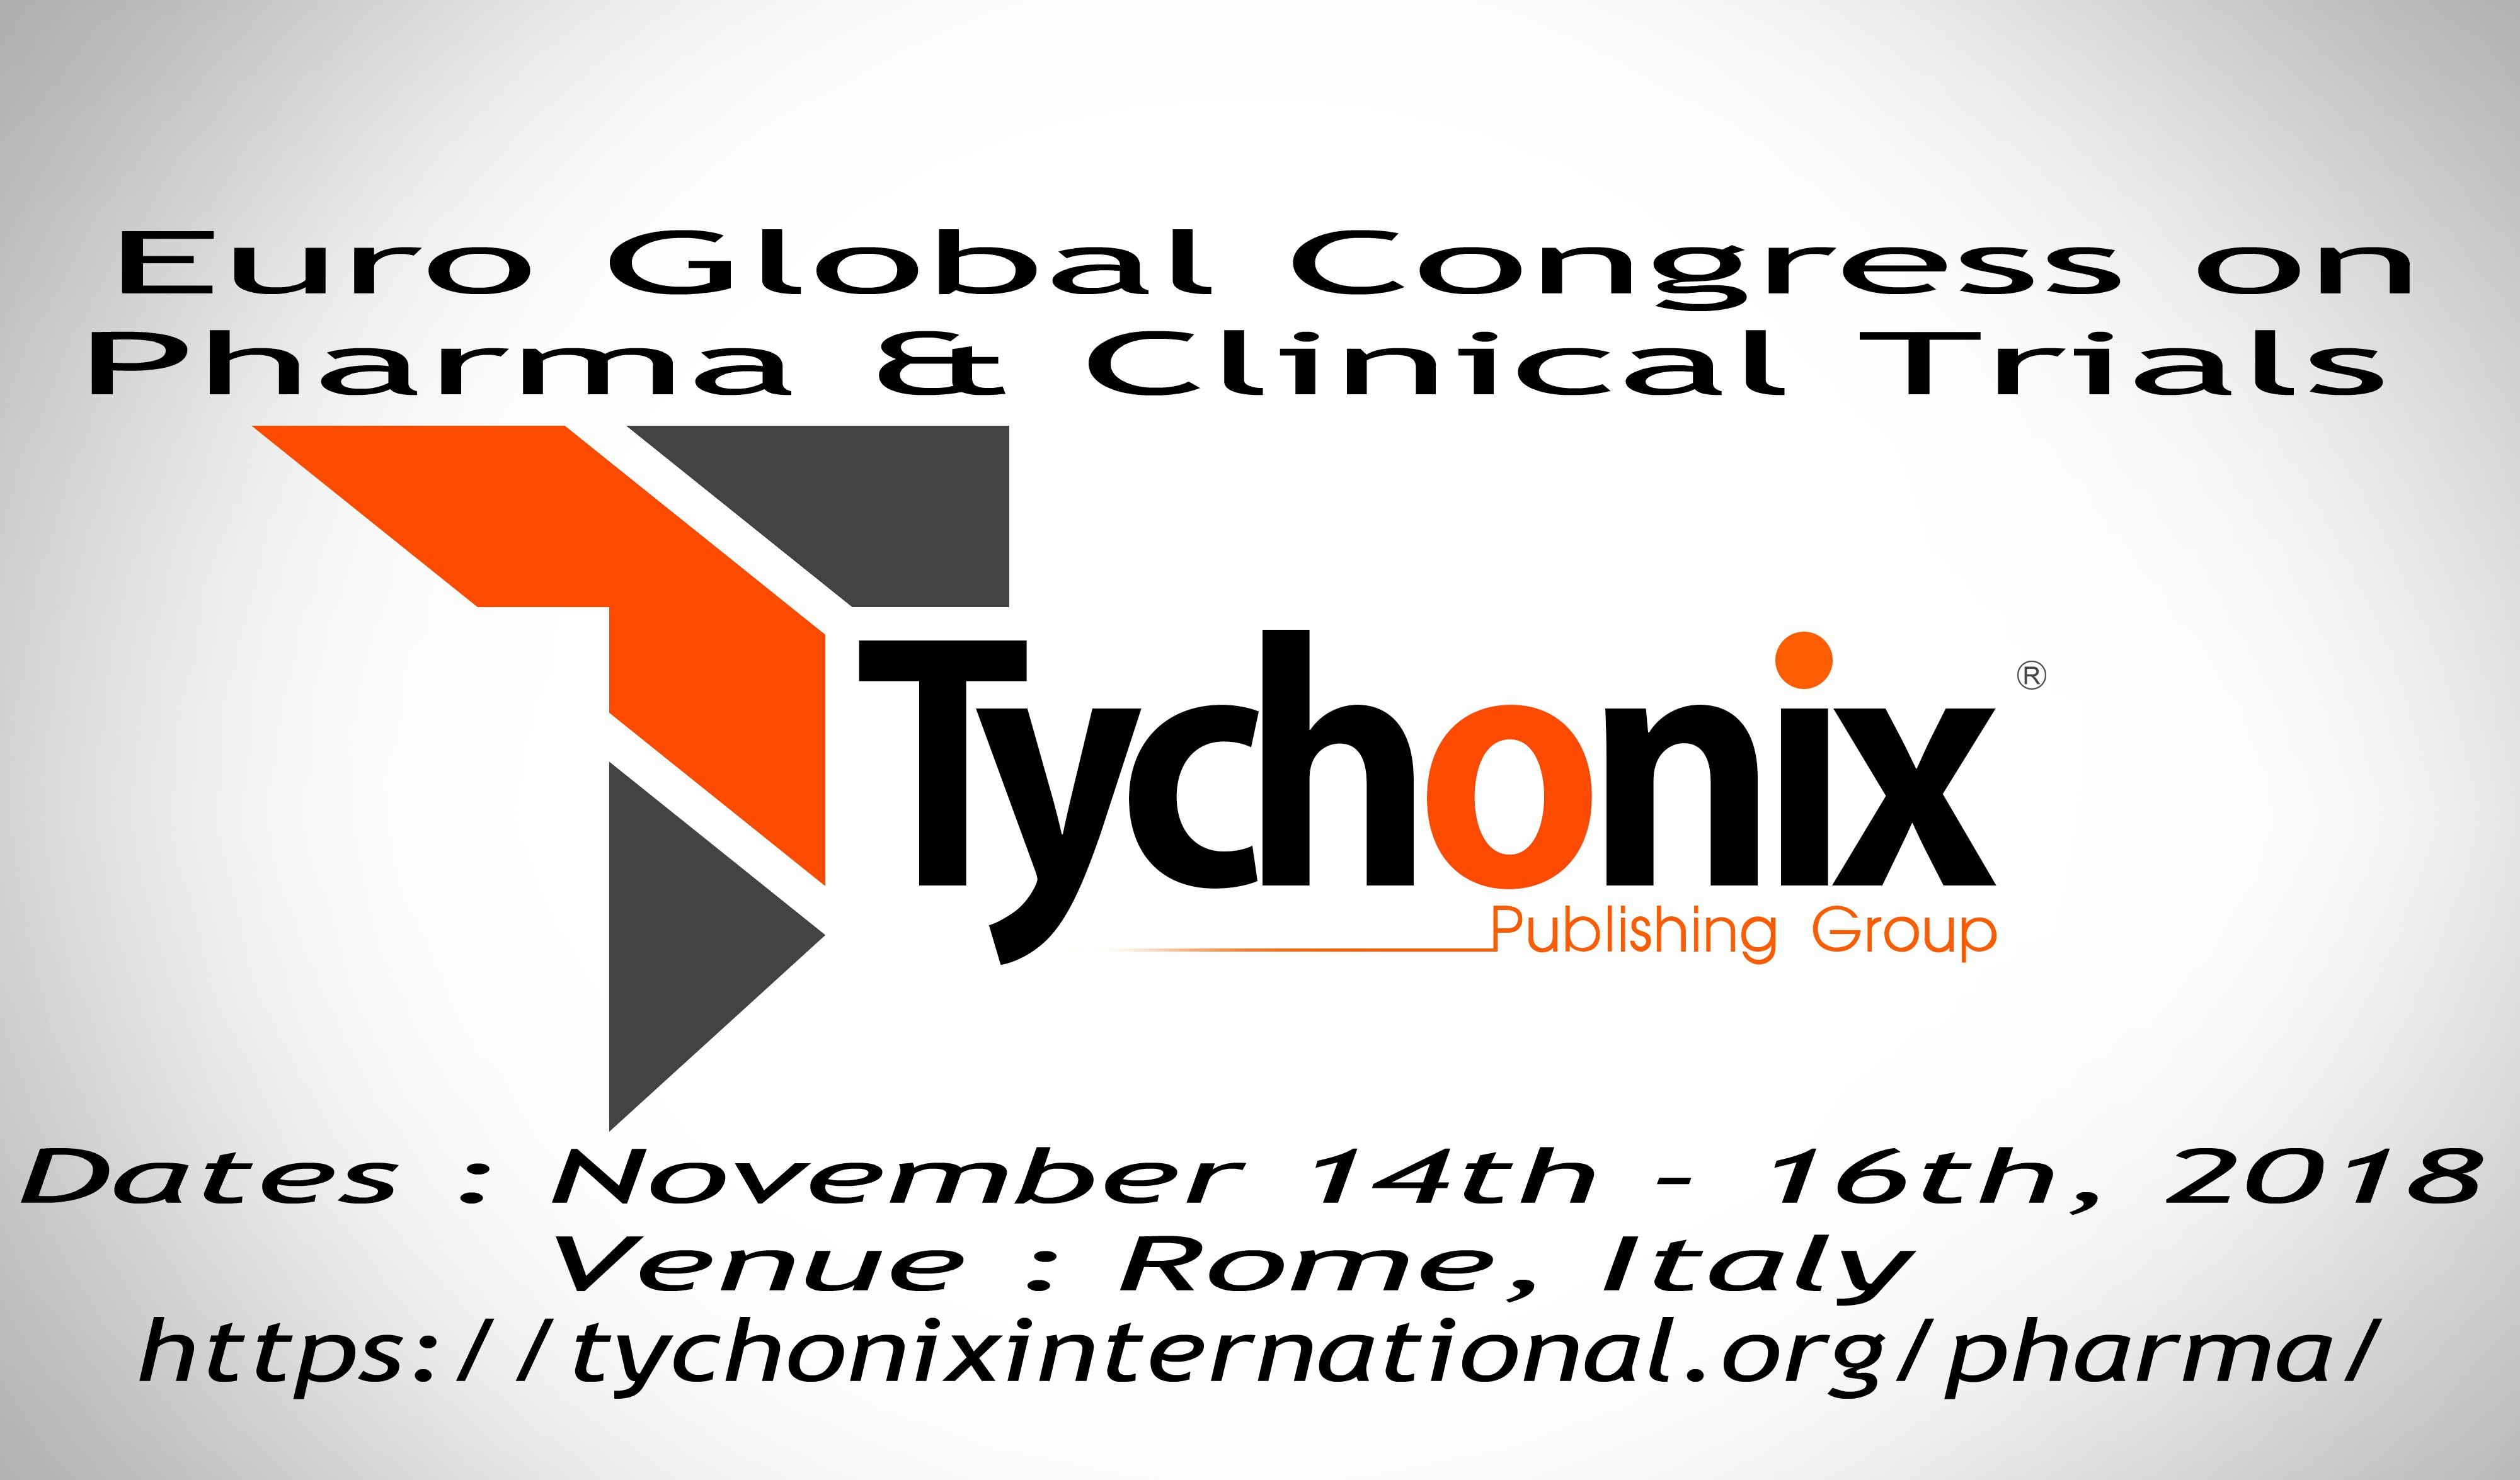 Euro Global Congress on Pharma & Clinical Trails